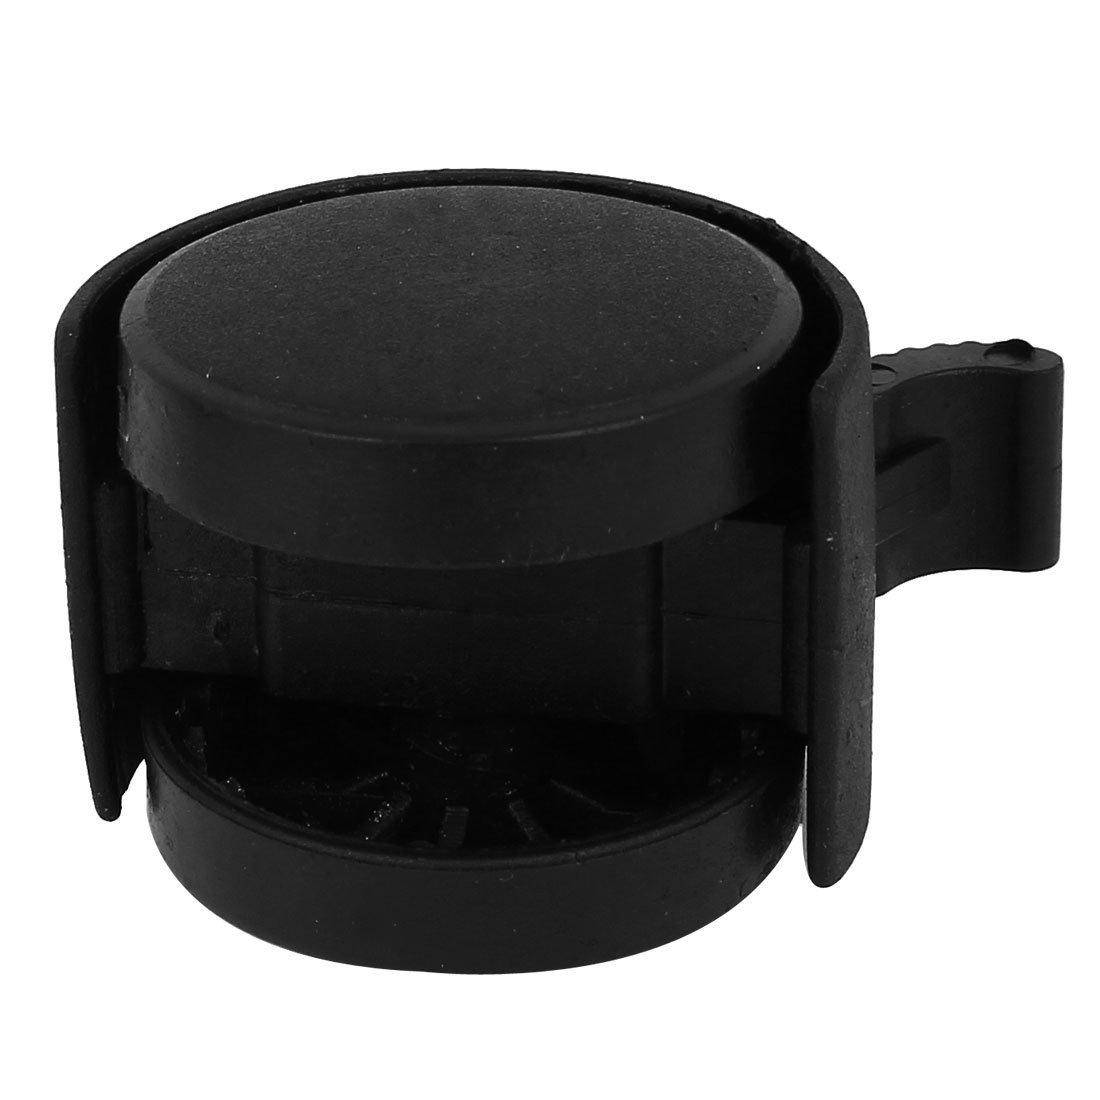 eDealMax Plastic Office Home Chair Swivel Caster 8mm Screw Stem 1.5 Inch Dia Wheel 4 Pcs by eDealMax (Image #2)